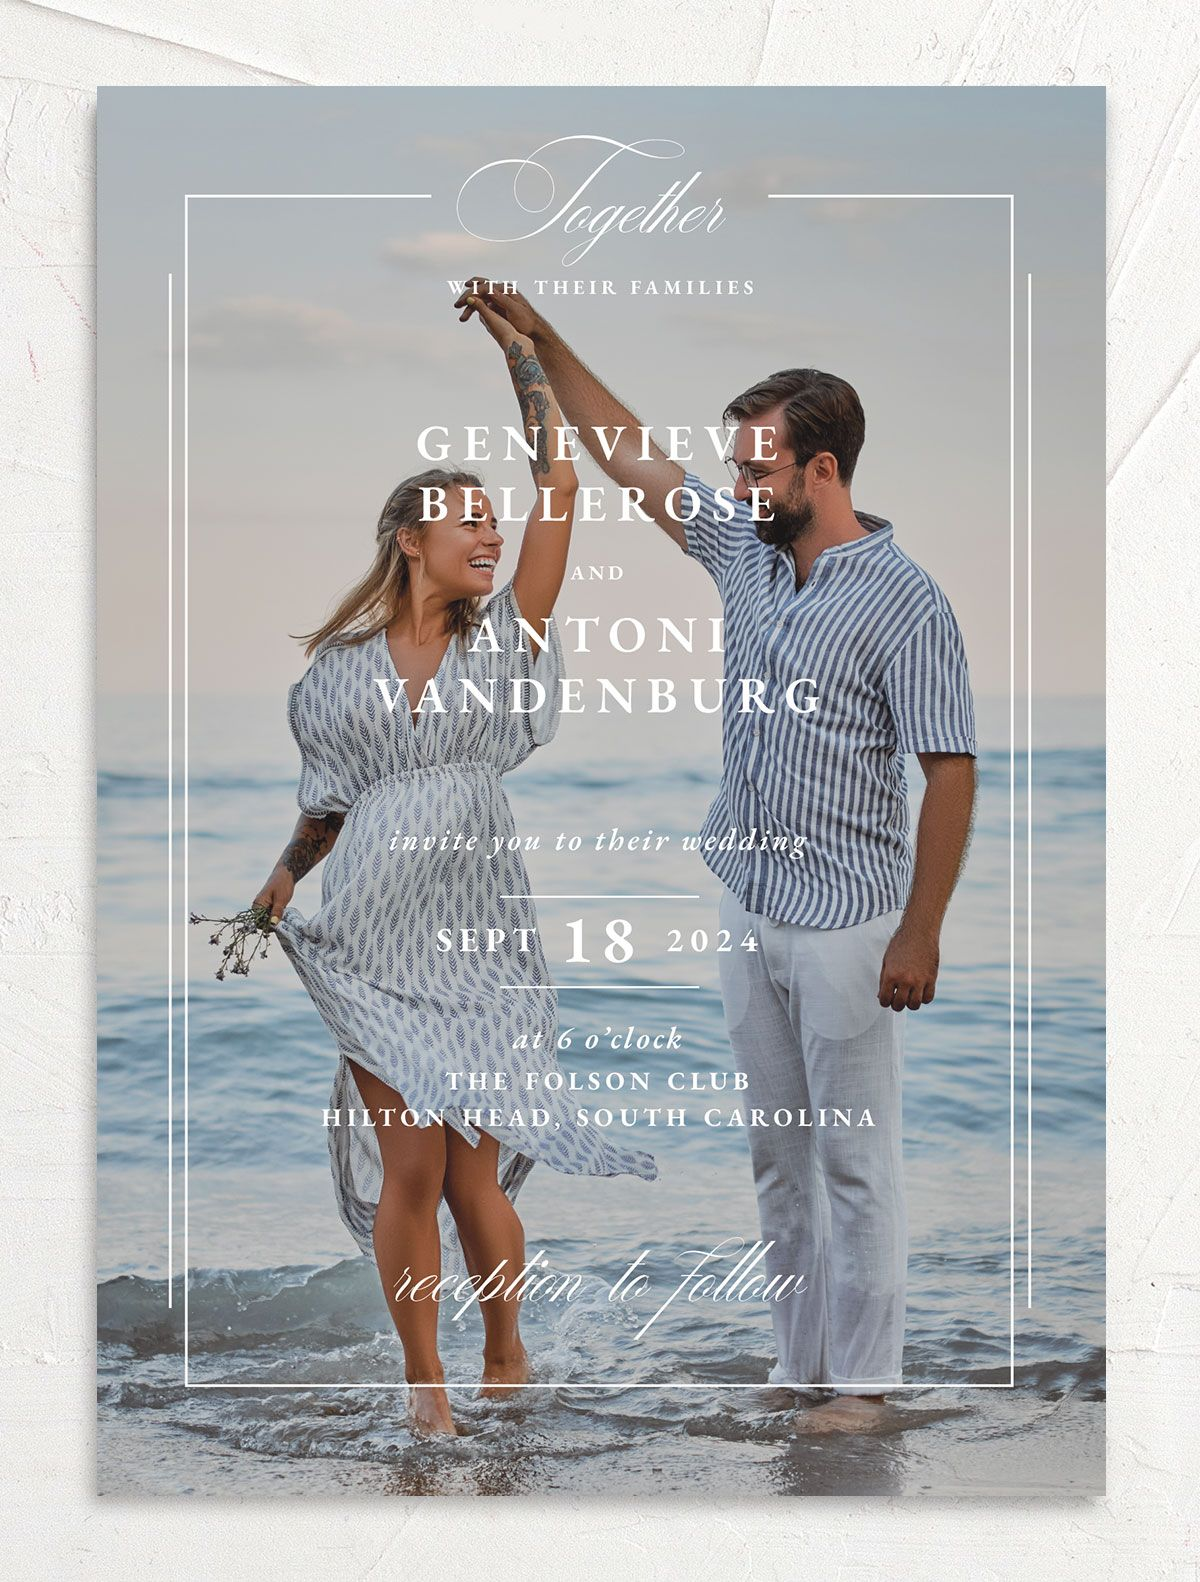 Elegant Photograph wedding invitation front